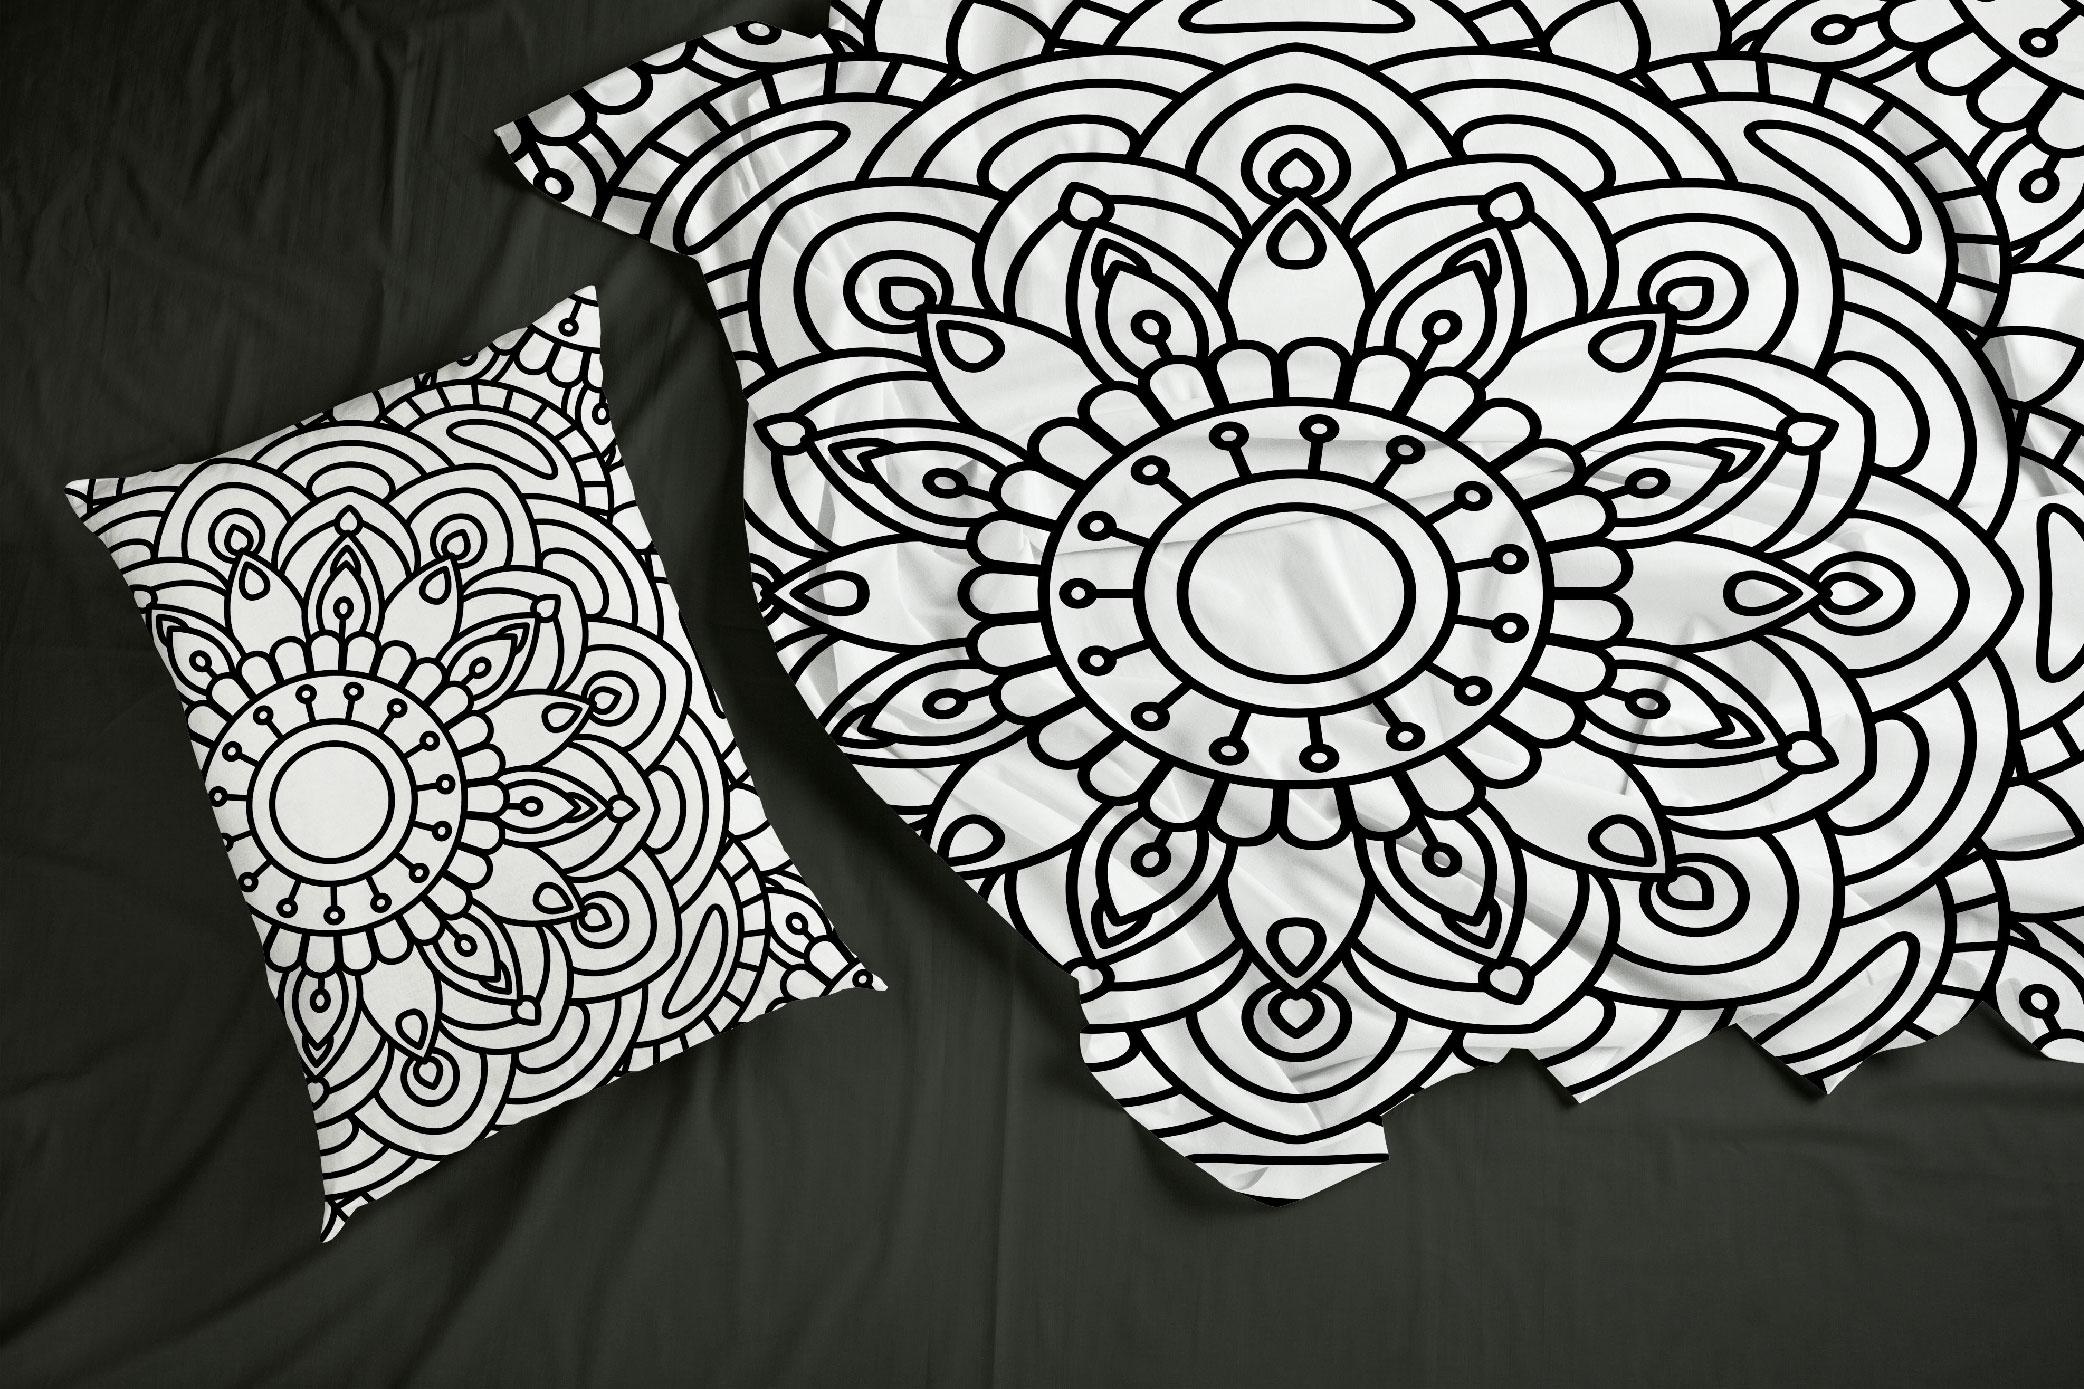 100 Mandalas Seamless Patterns example image 4